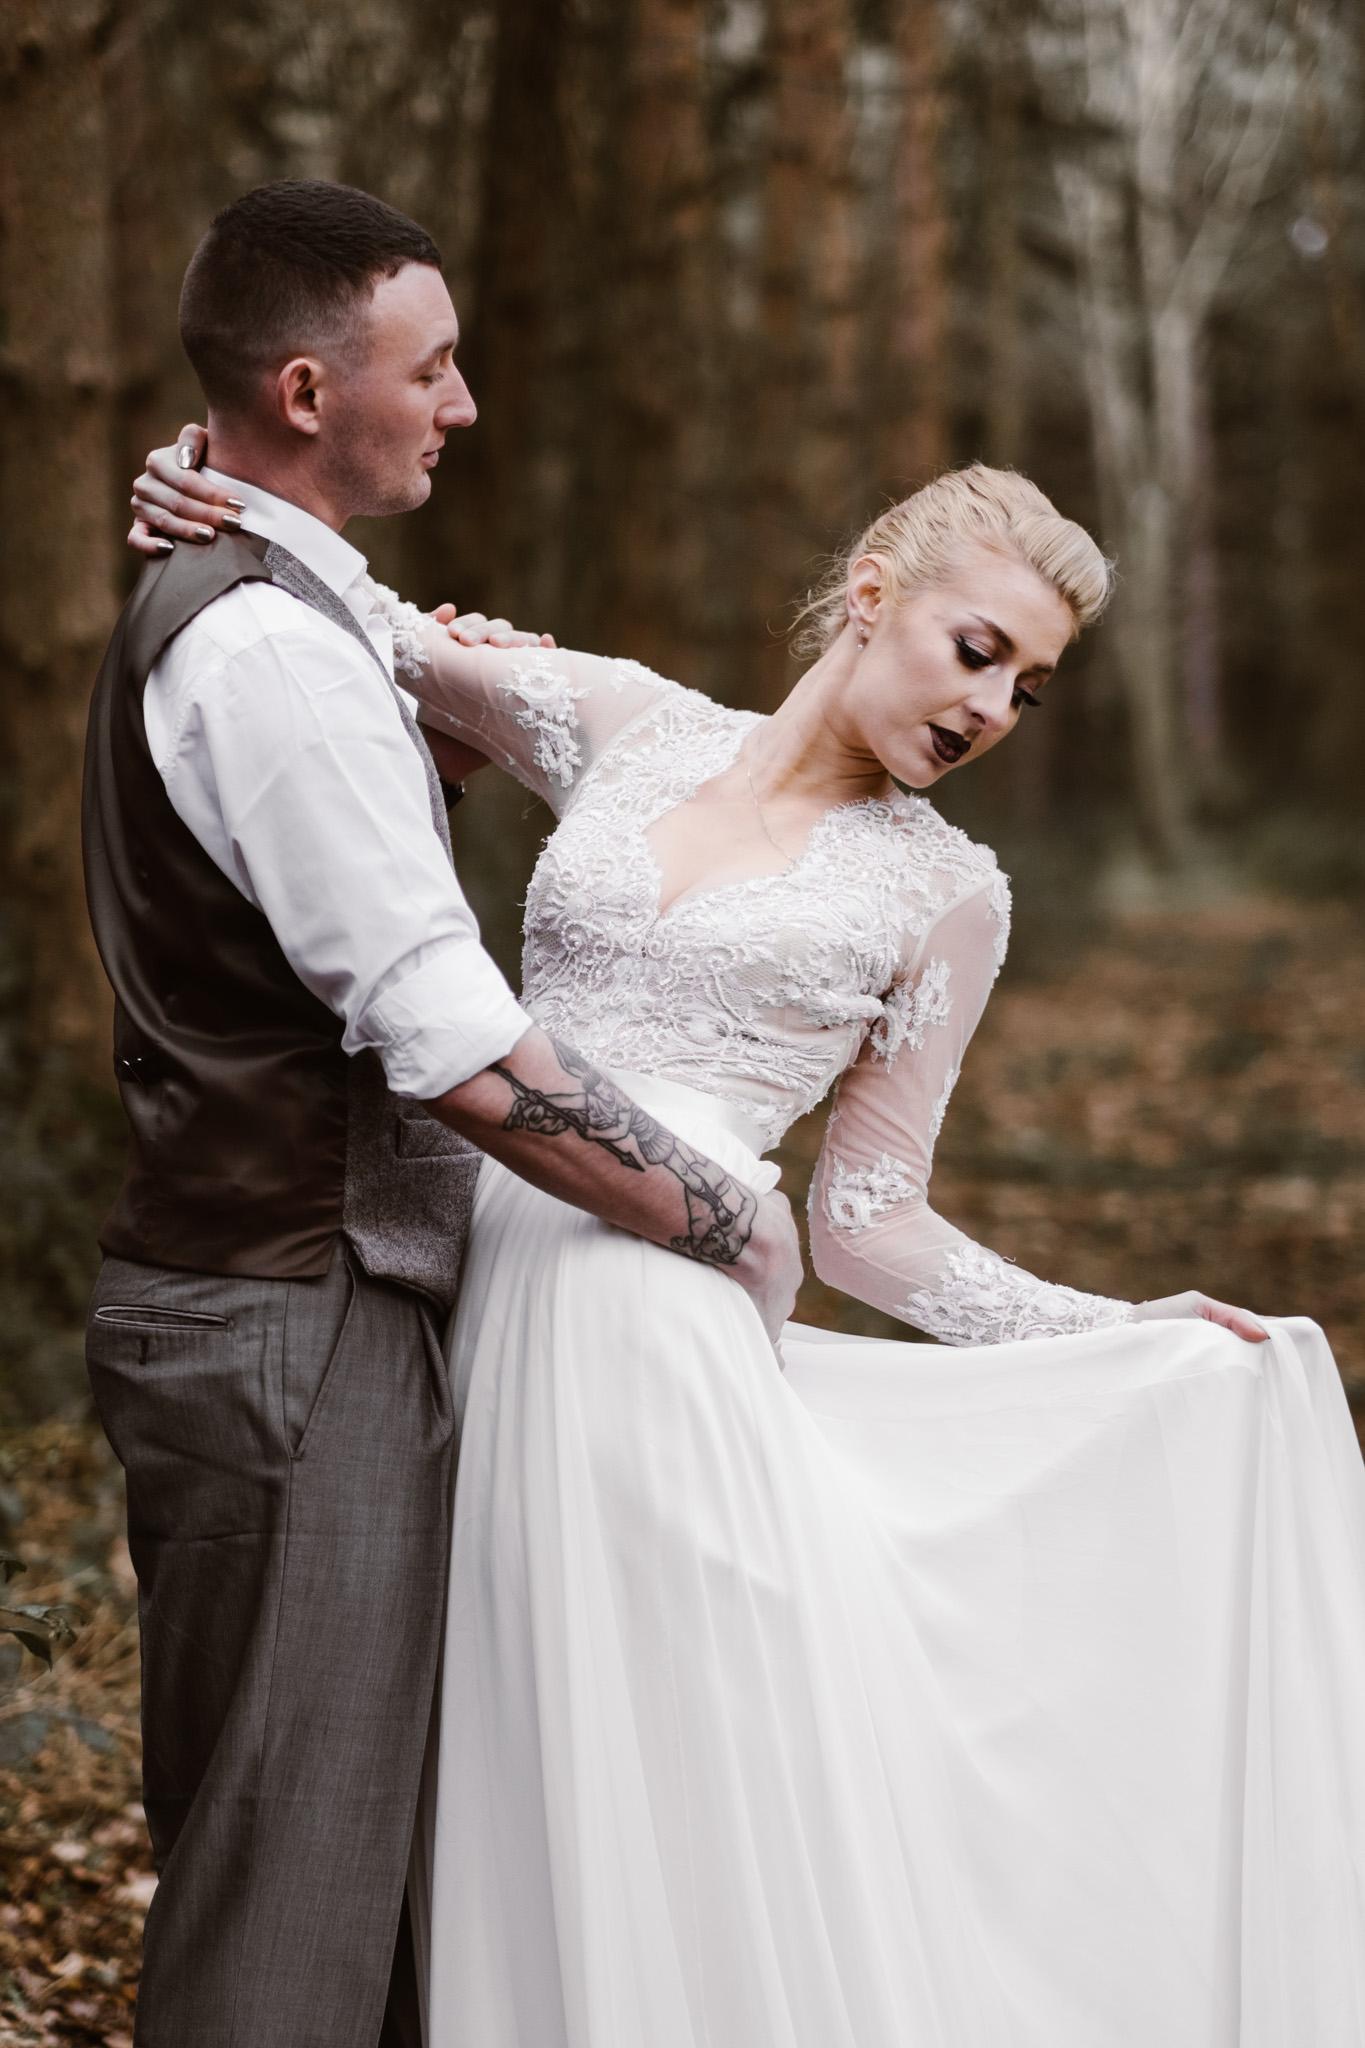 Captains-Wood-Barn-Alterative-Rustic-Vintage-Essex-Wedding-Suffolk-Grace-Elizabeth-49.jpg